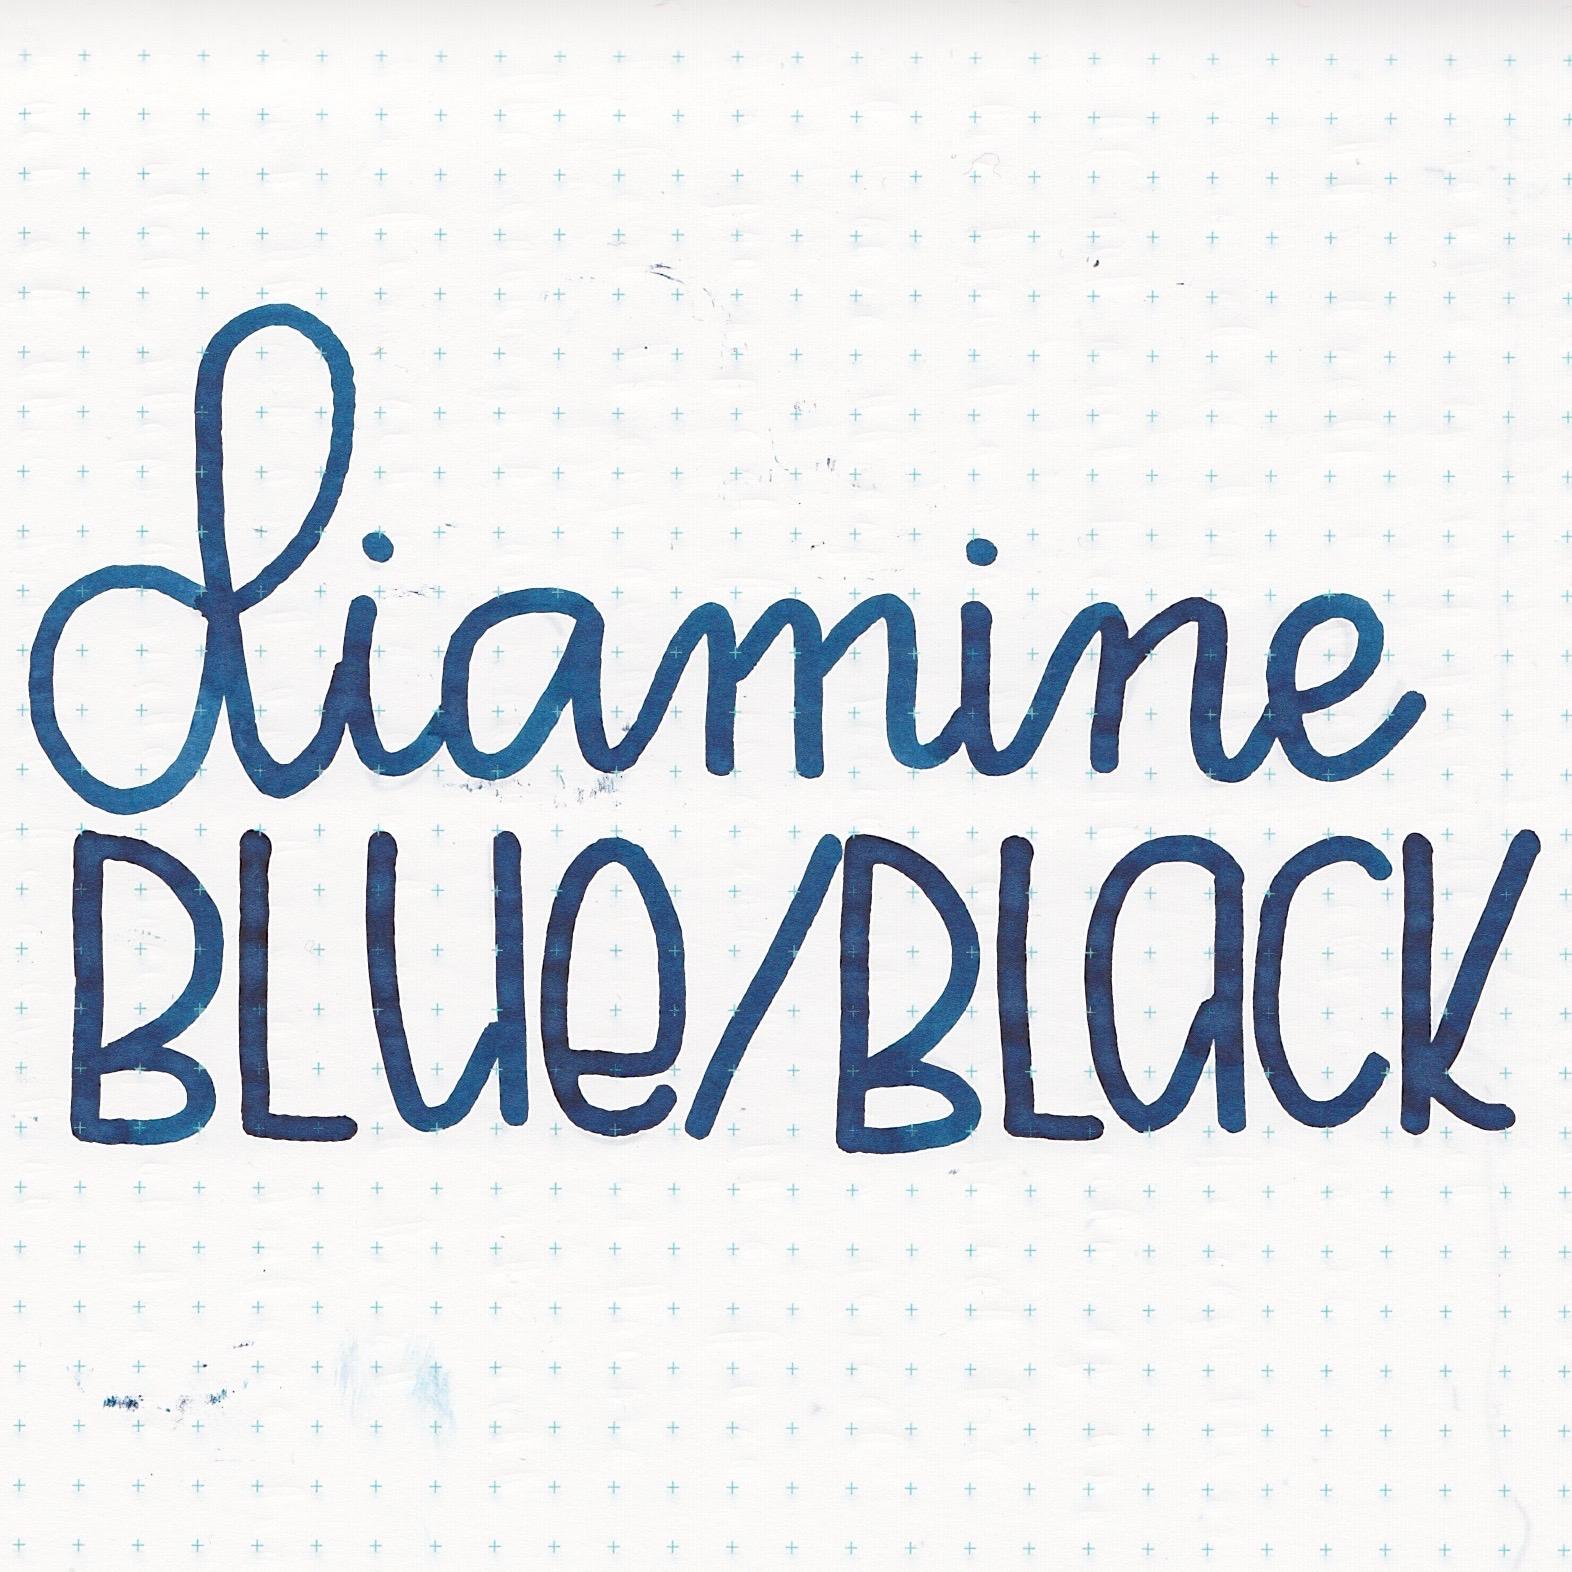 DBlue-Black - 11.jpg